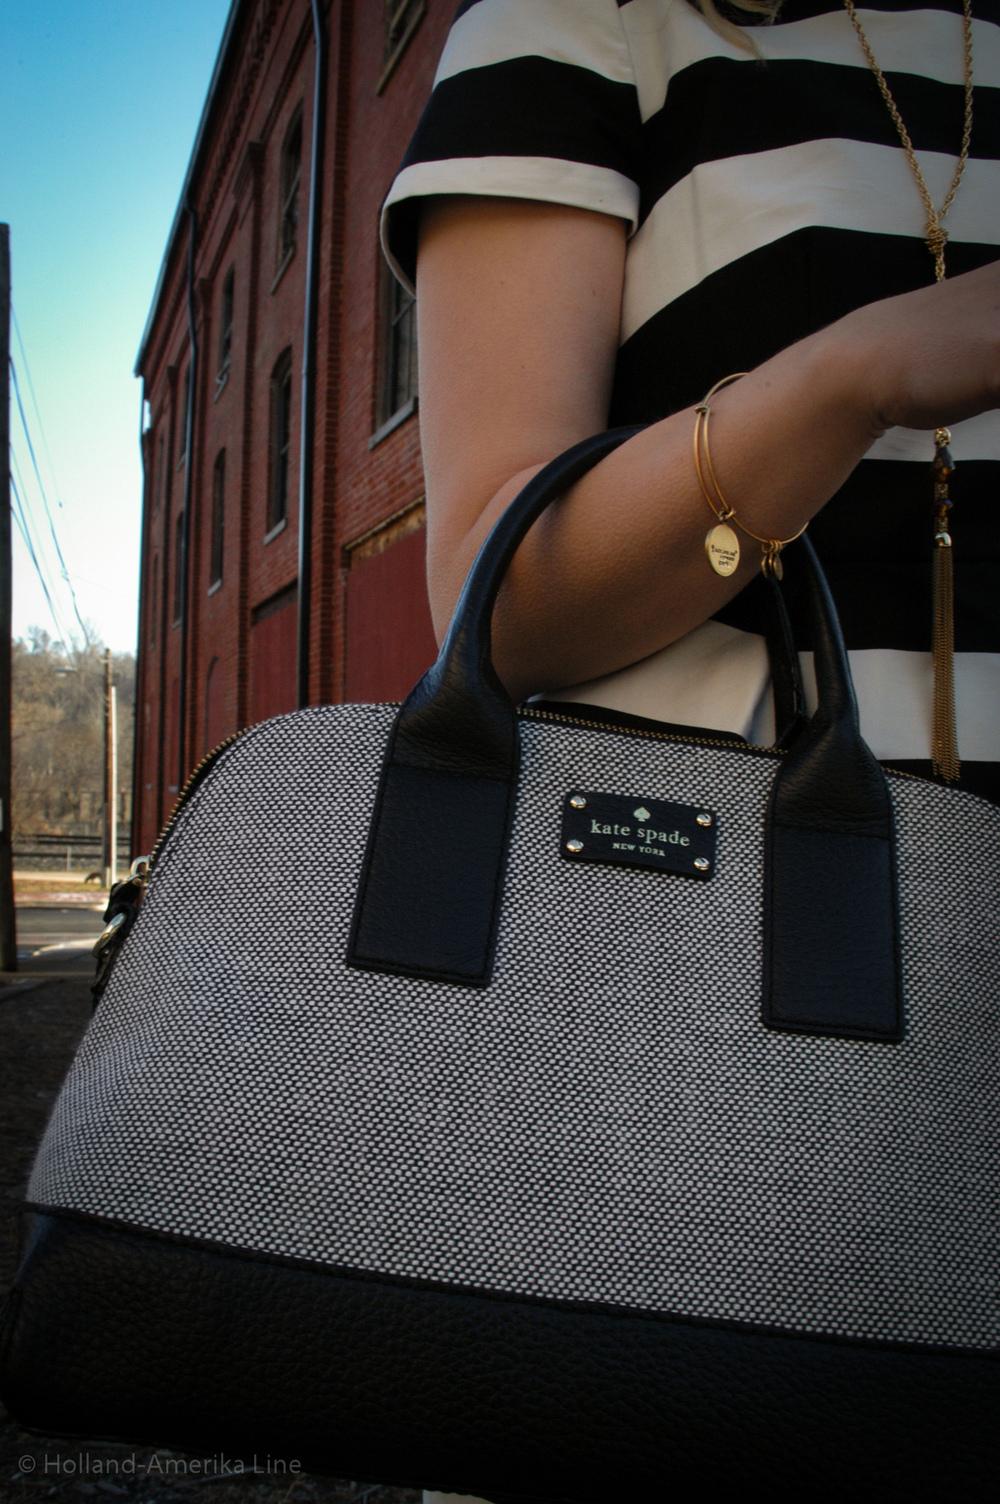 Jacket:  Forever21  | Dress:  H&M  | Boots:  Corso Como via Gilt  | Bag:  Kate Spade  (Southport Jenny) | Necklace: Target (similar)  | Bracelet:  Alex & Ani | Sunglasses:  Ray-Ban via SunglassHut